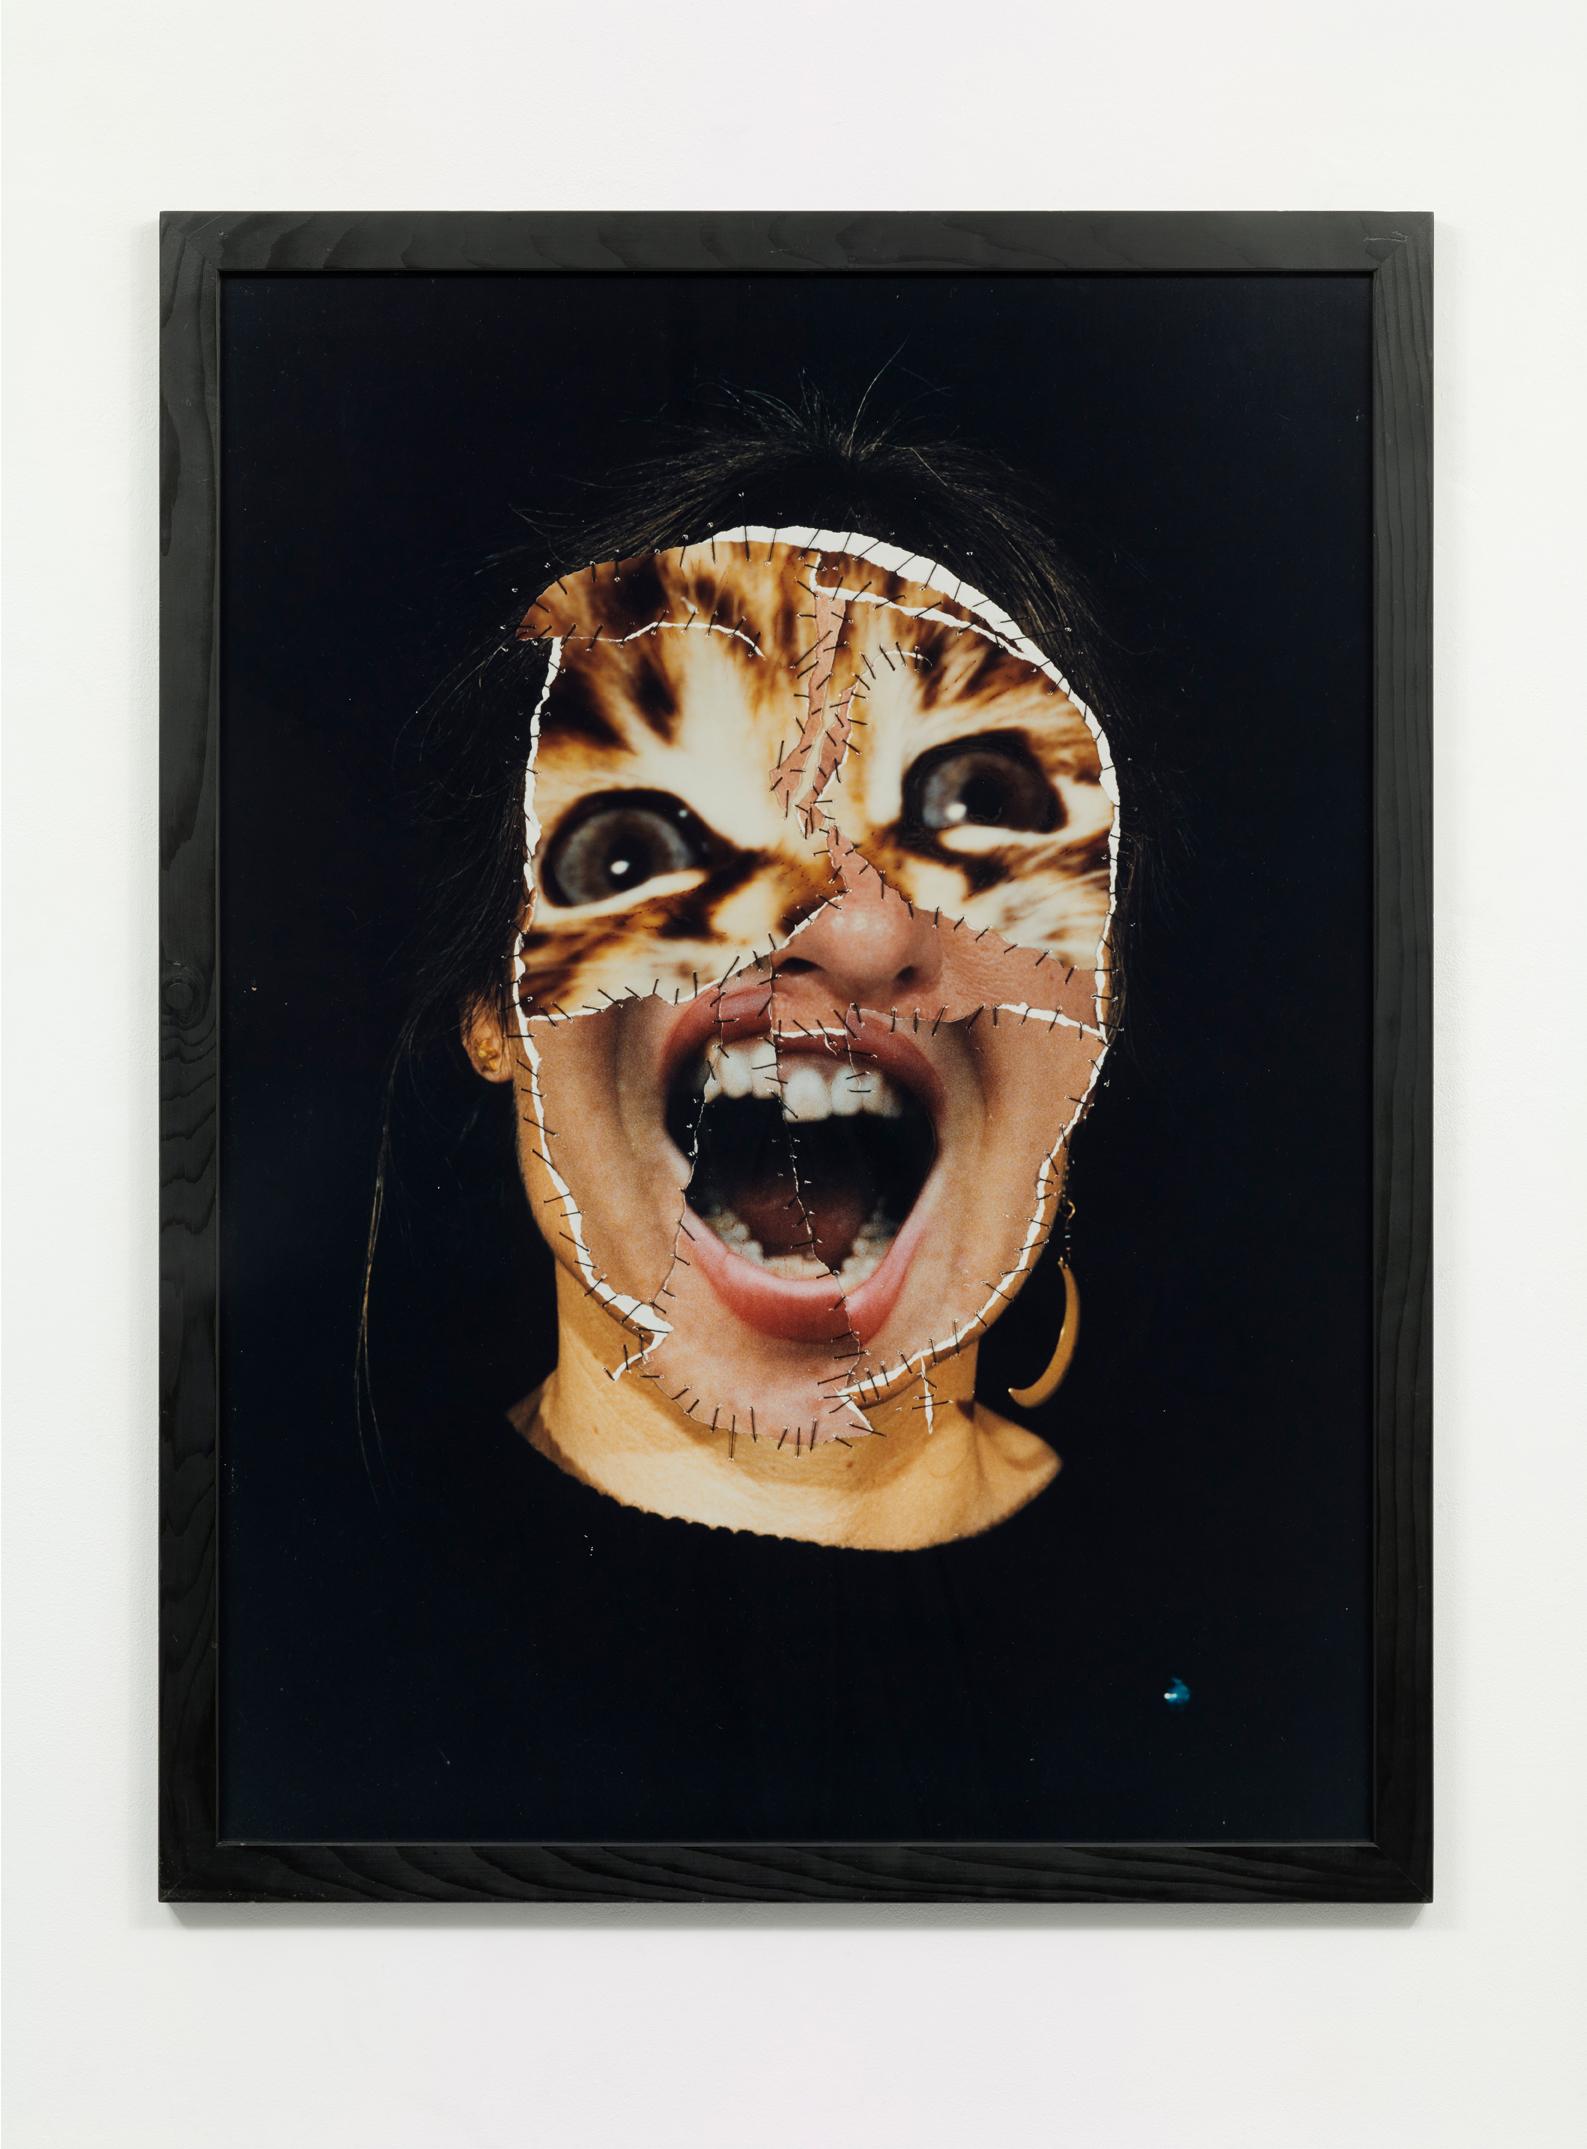 Annegret Soltau, GRIMA - Self with cat (three screams), 1986